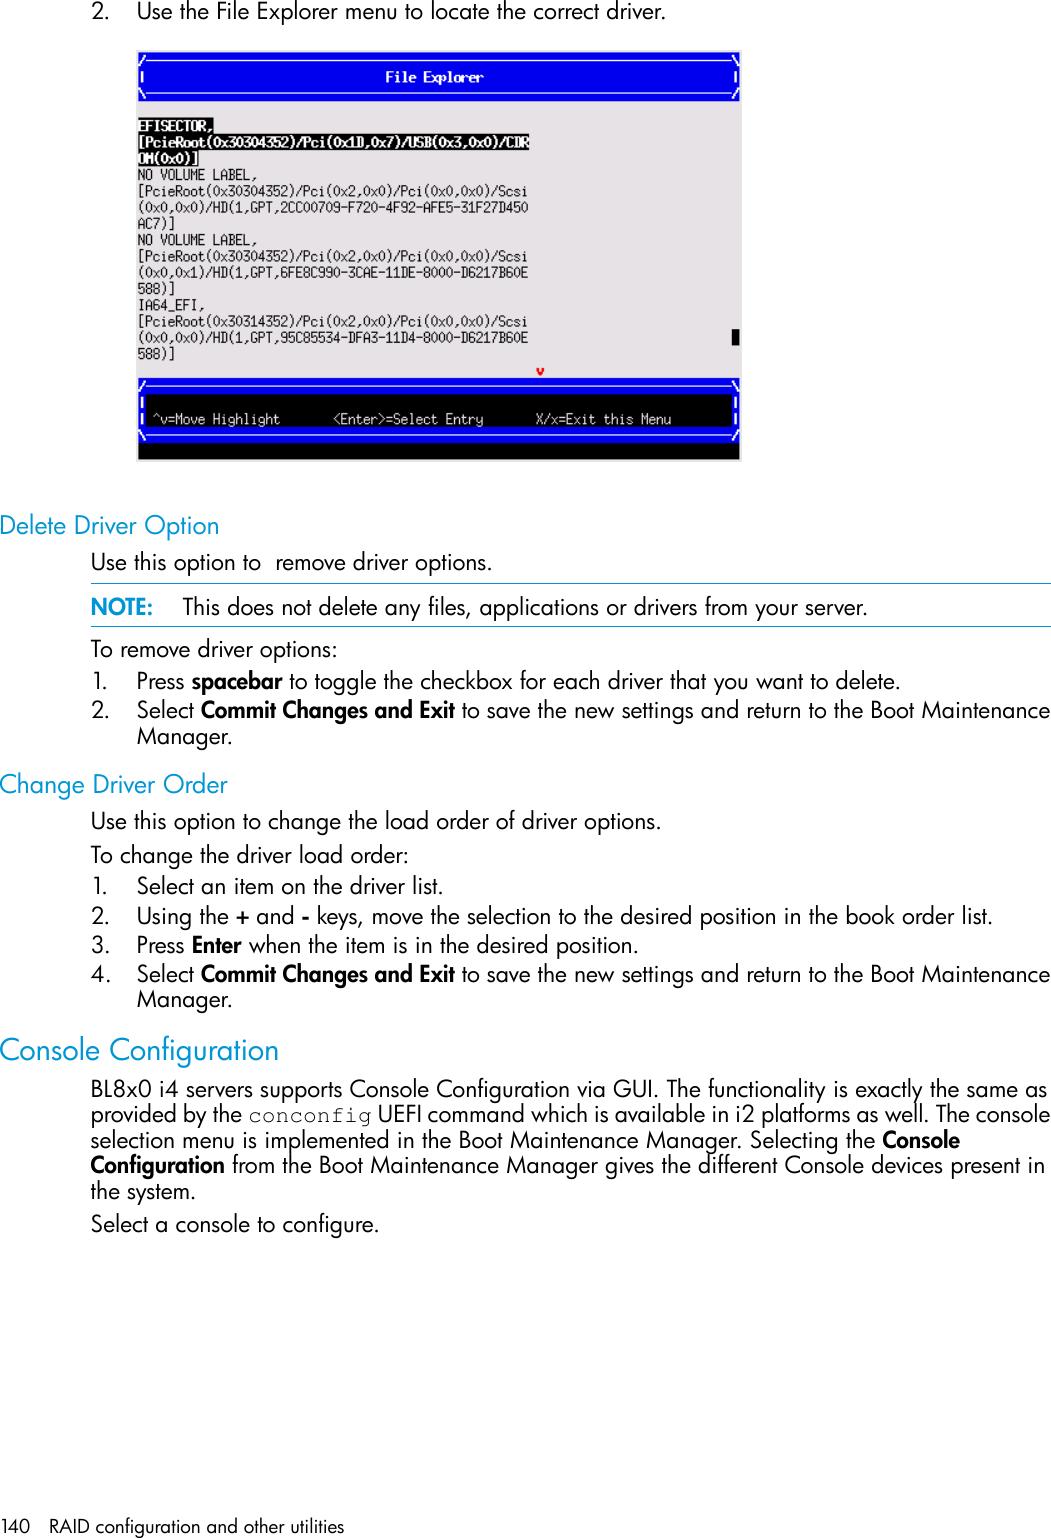 Gpt rm-788 manual pdf